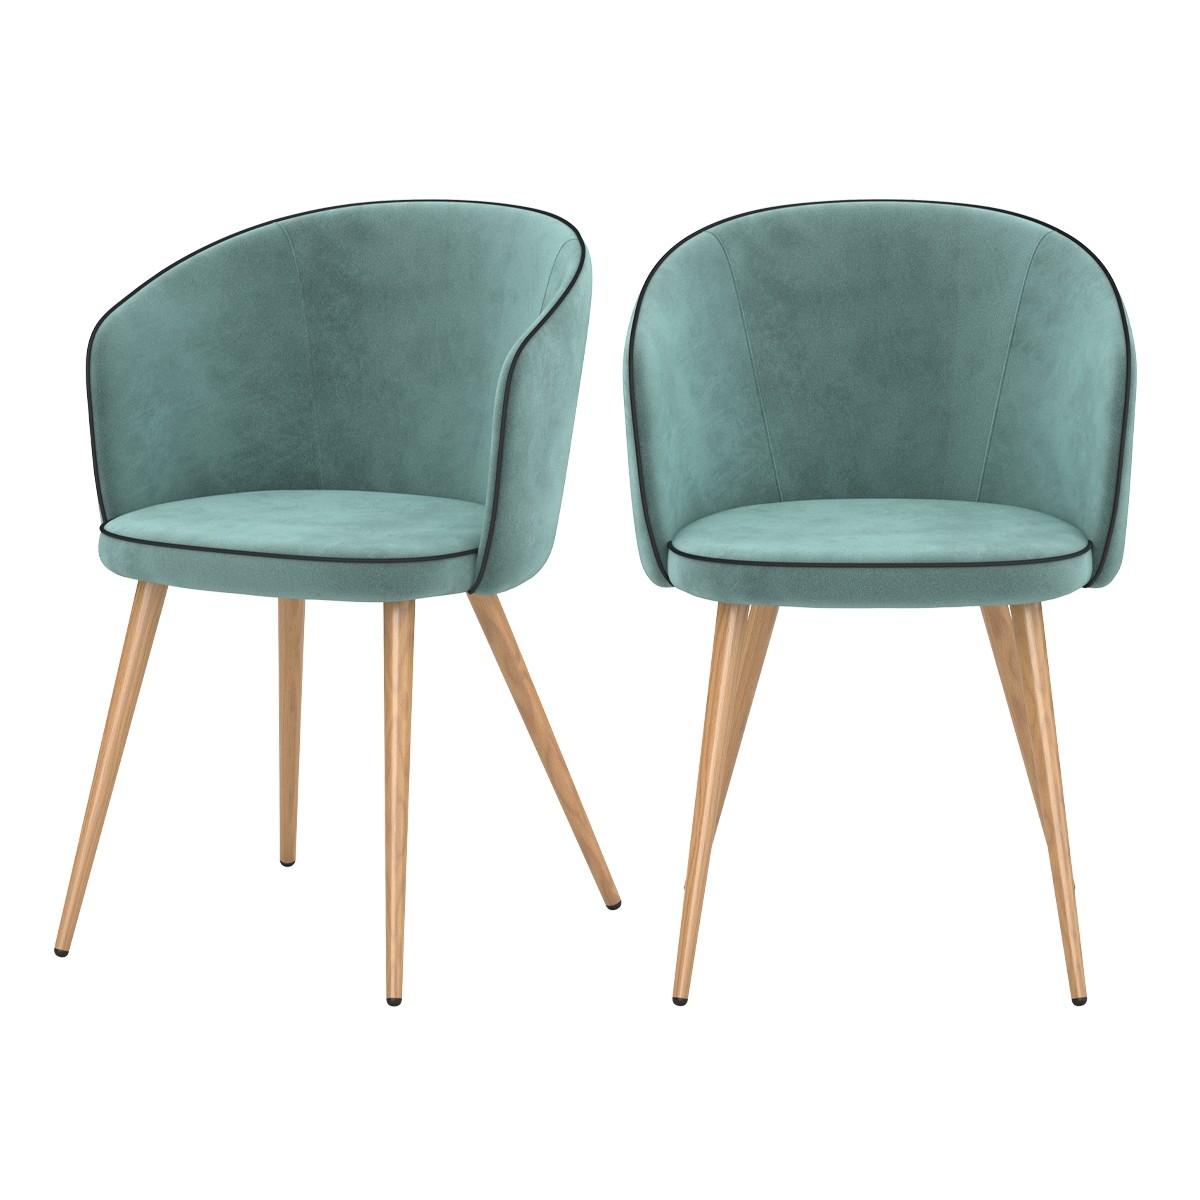 achat chaise arrondie assise velours pieds imitation bois